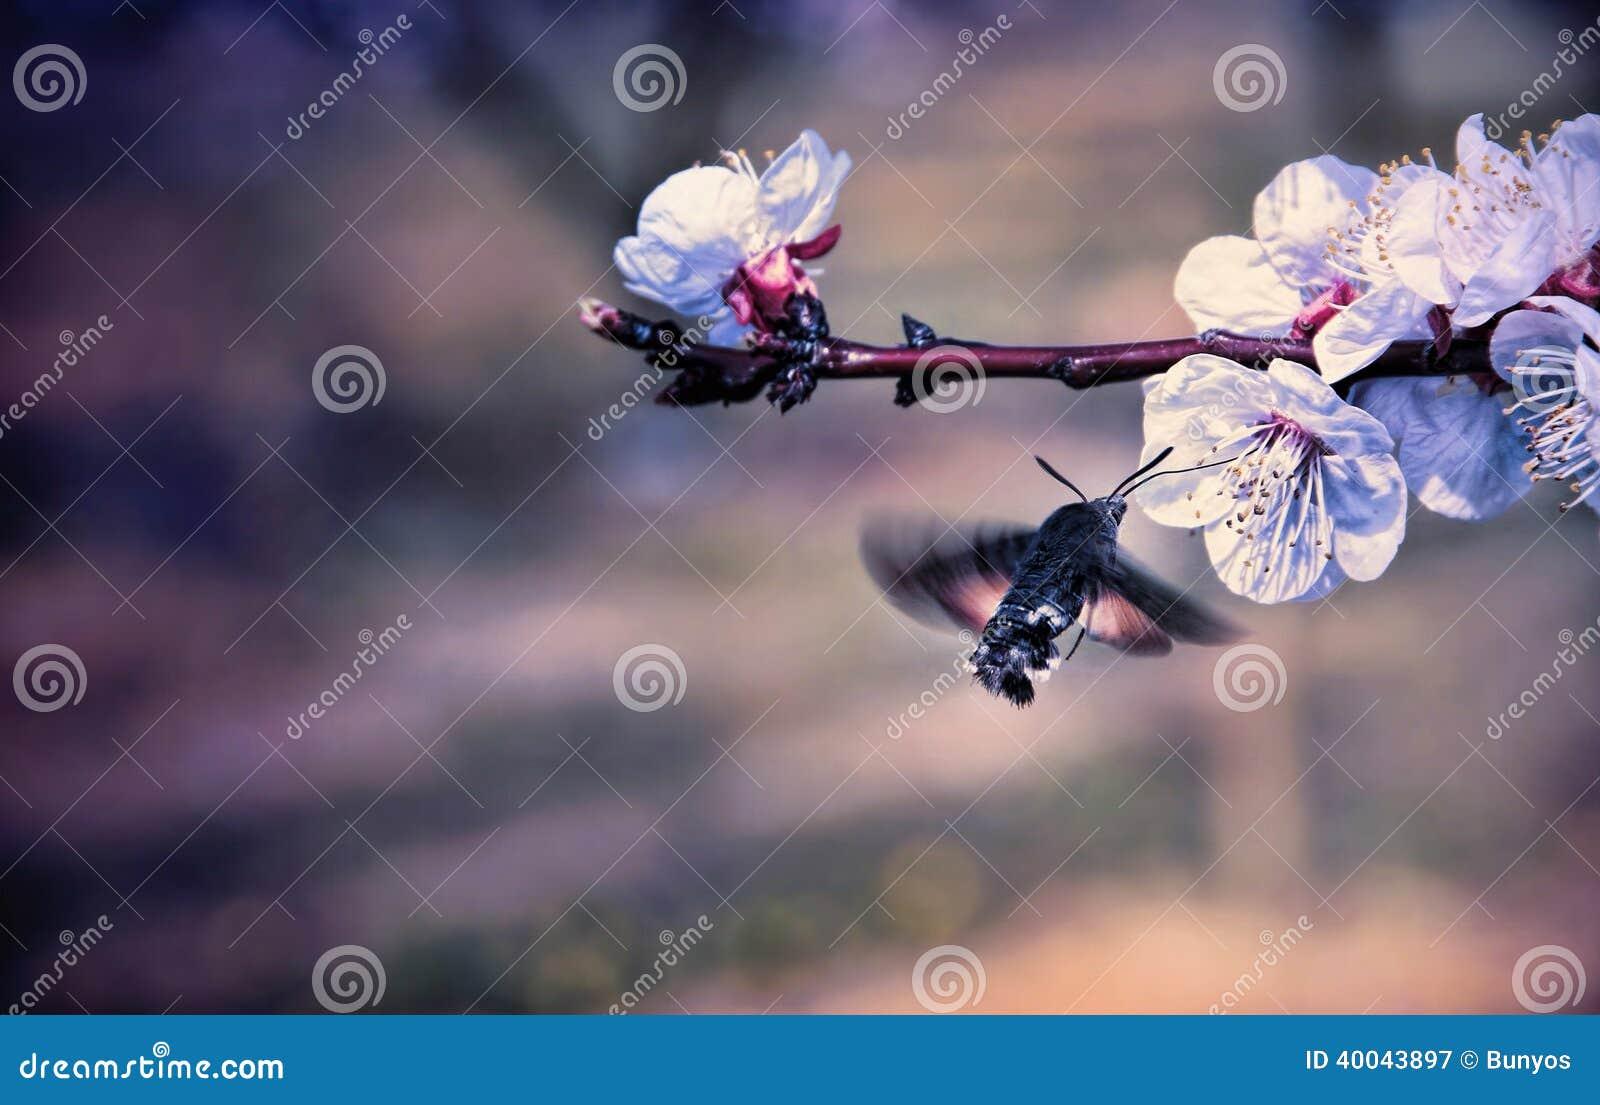 Hummingmoth pollinisent une fleur